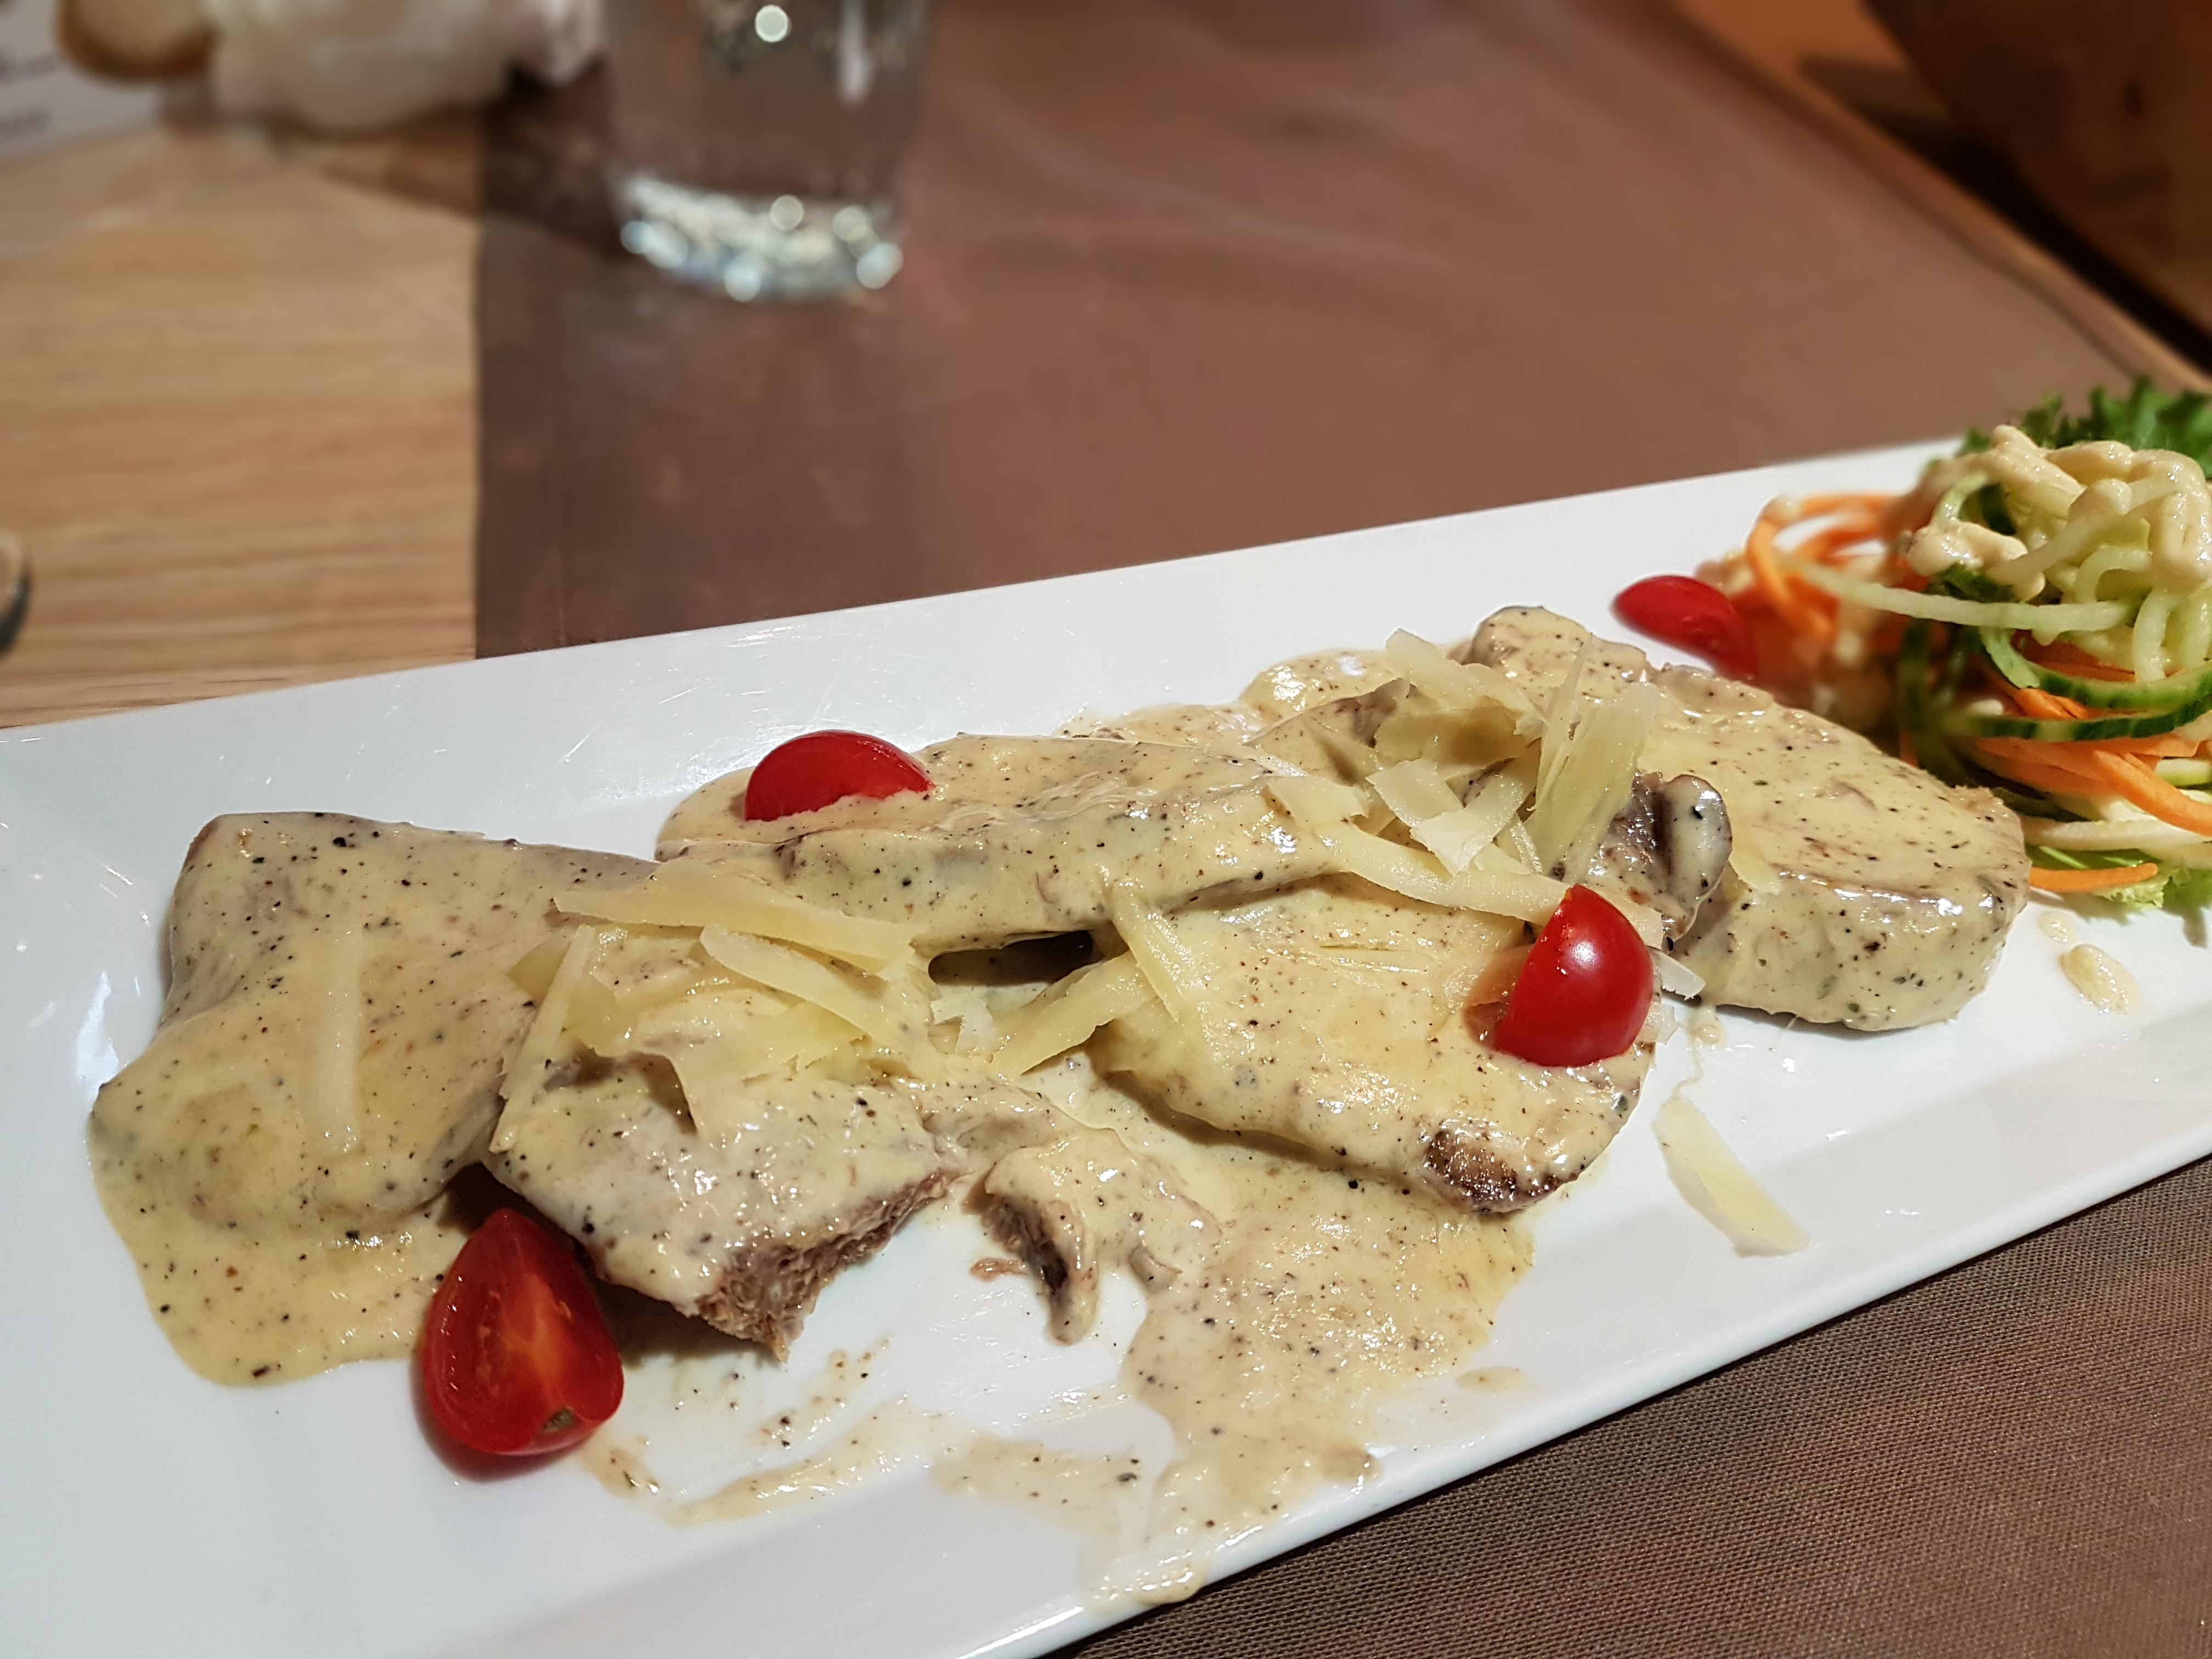 Телешки език с горчичен сос в Di Valli / Beef tongue in a mustard sauce, placescases.com